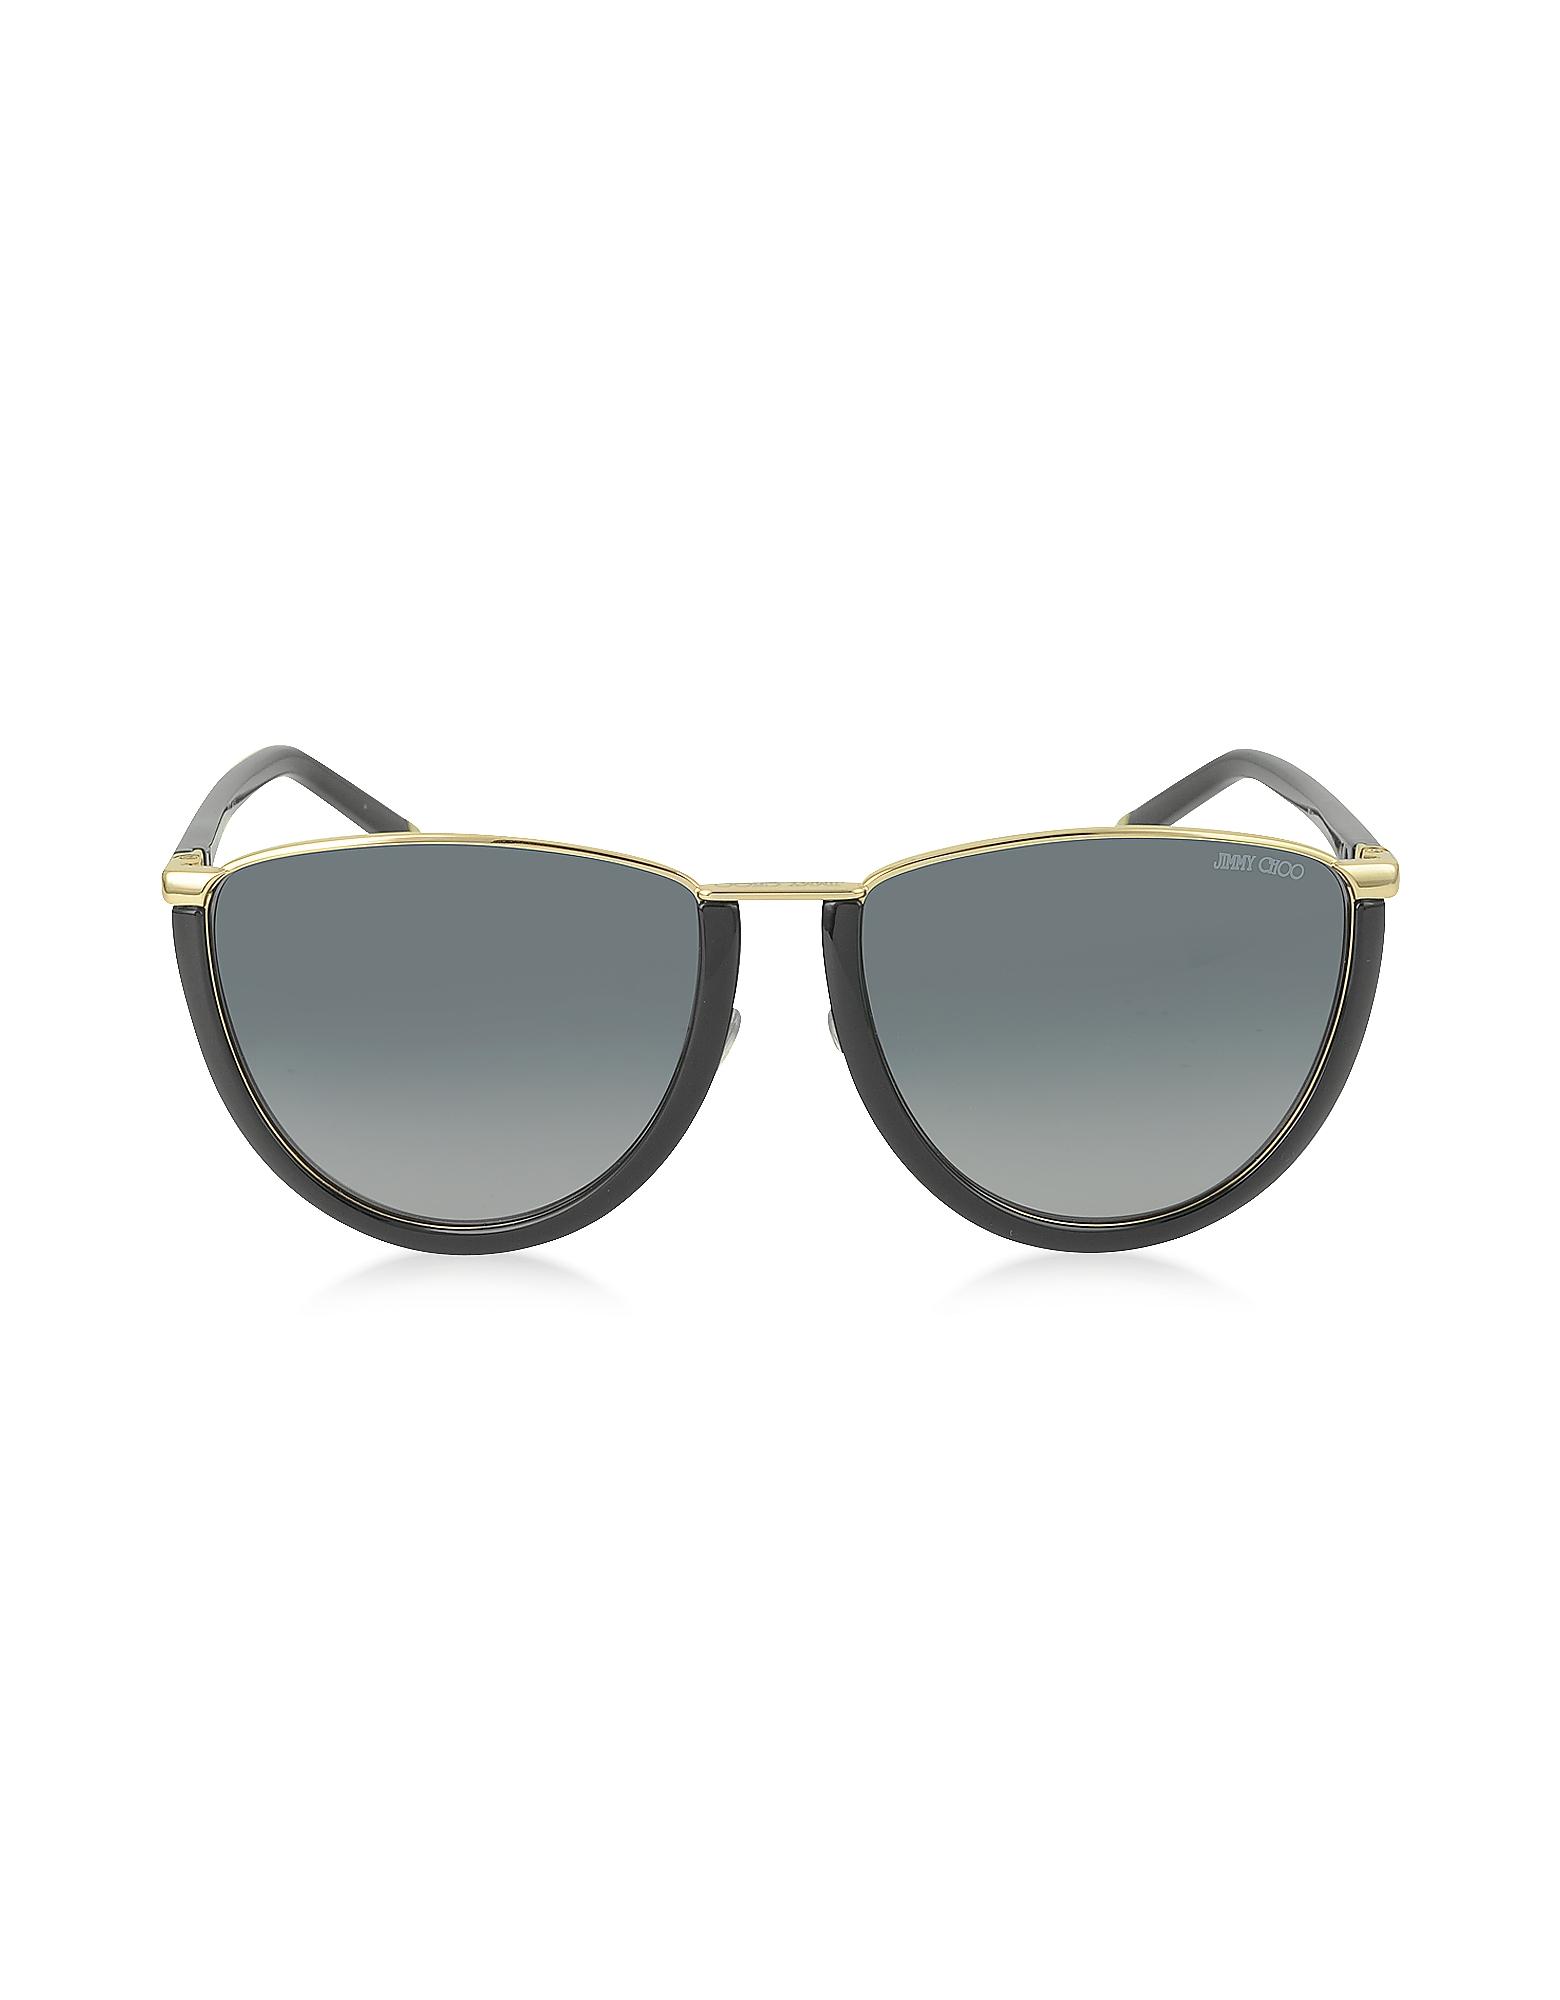 1146a285674 Jimmy Choo - Mila s Wl4hd Gold And Black Women s Sunglasses - Lyst. View  fullscreen